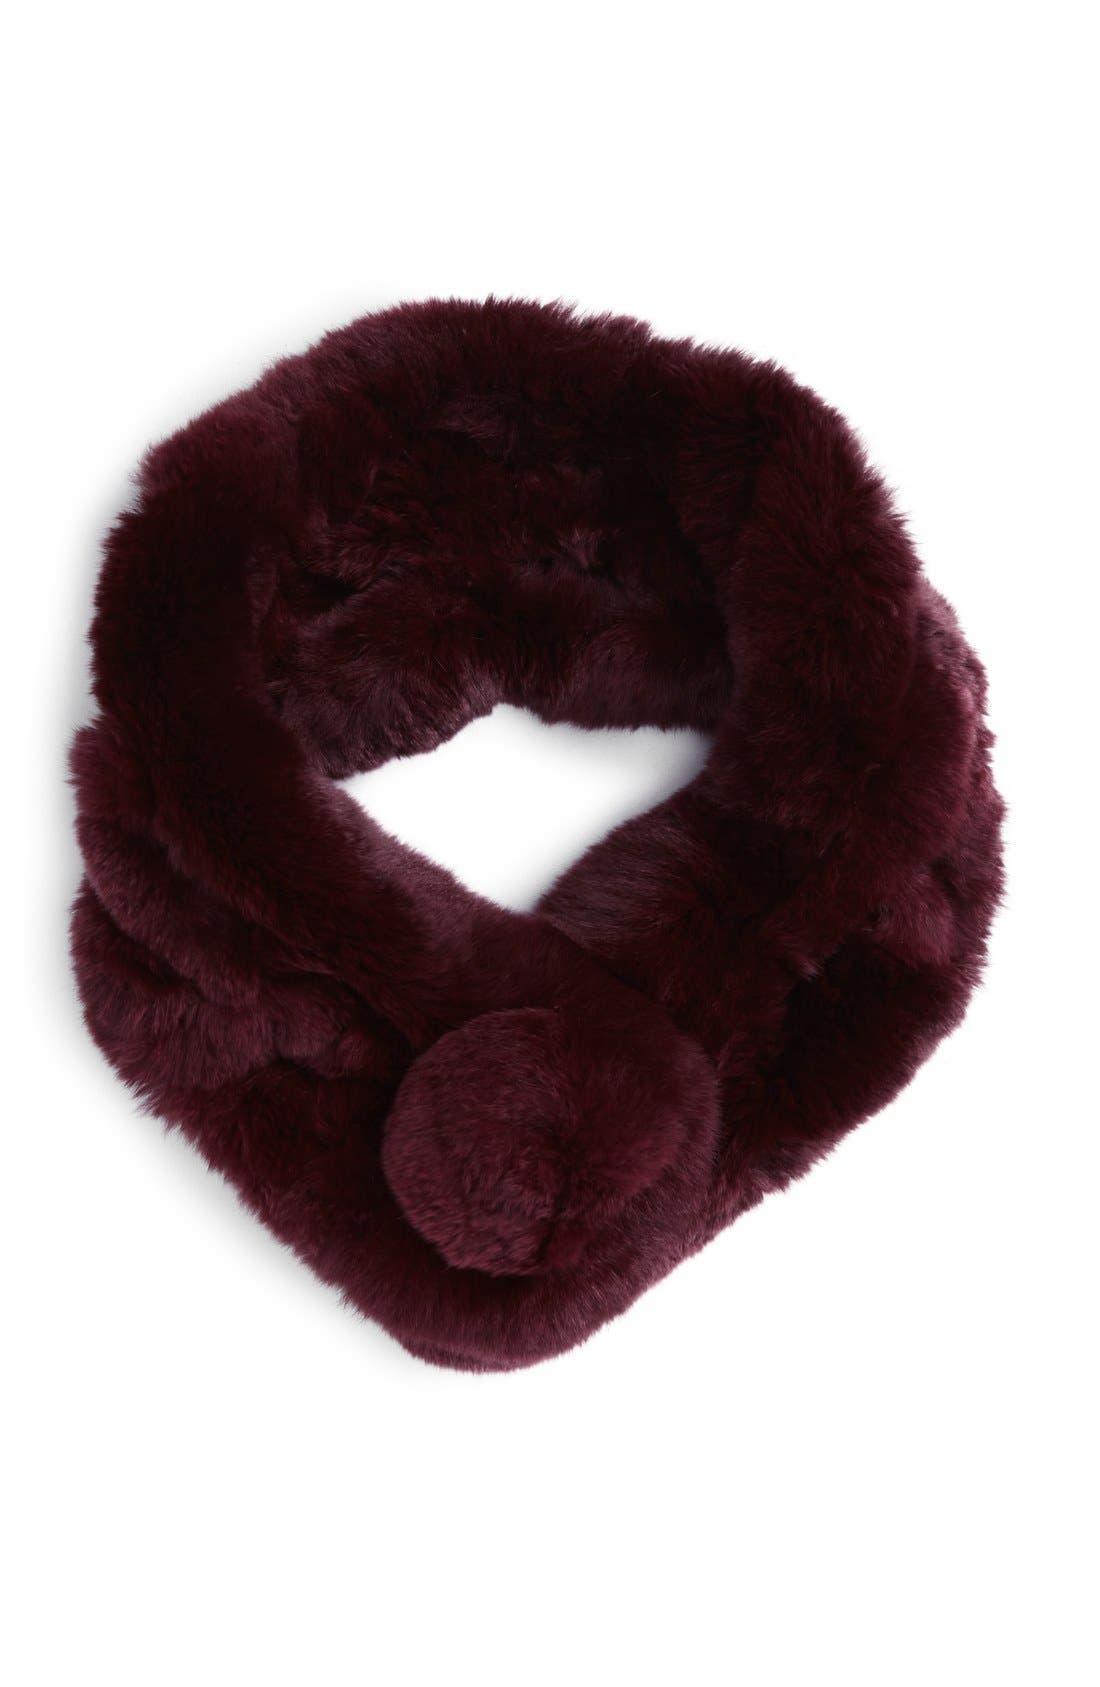 Alternate Image 1 Selected - Vincent Pradier Genuine Rabbit Fur Scarf